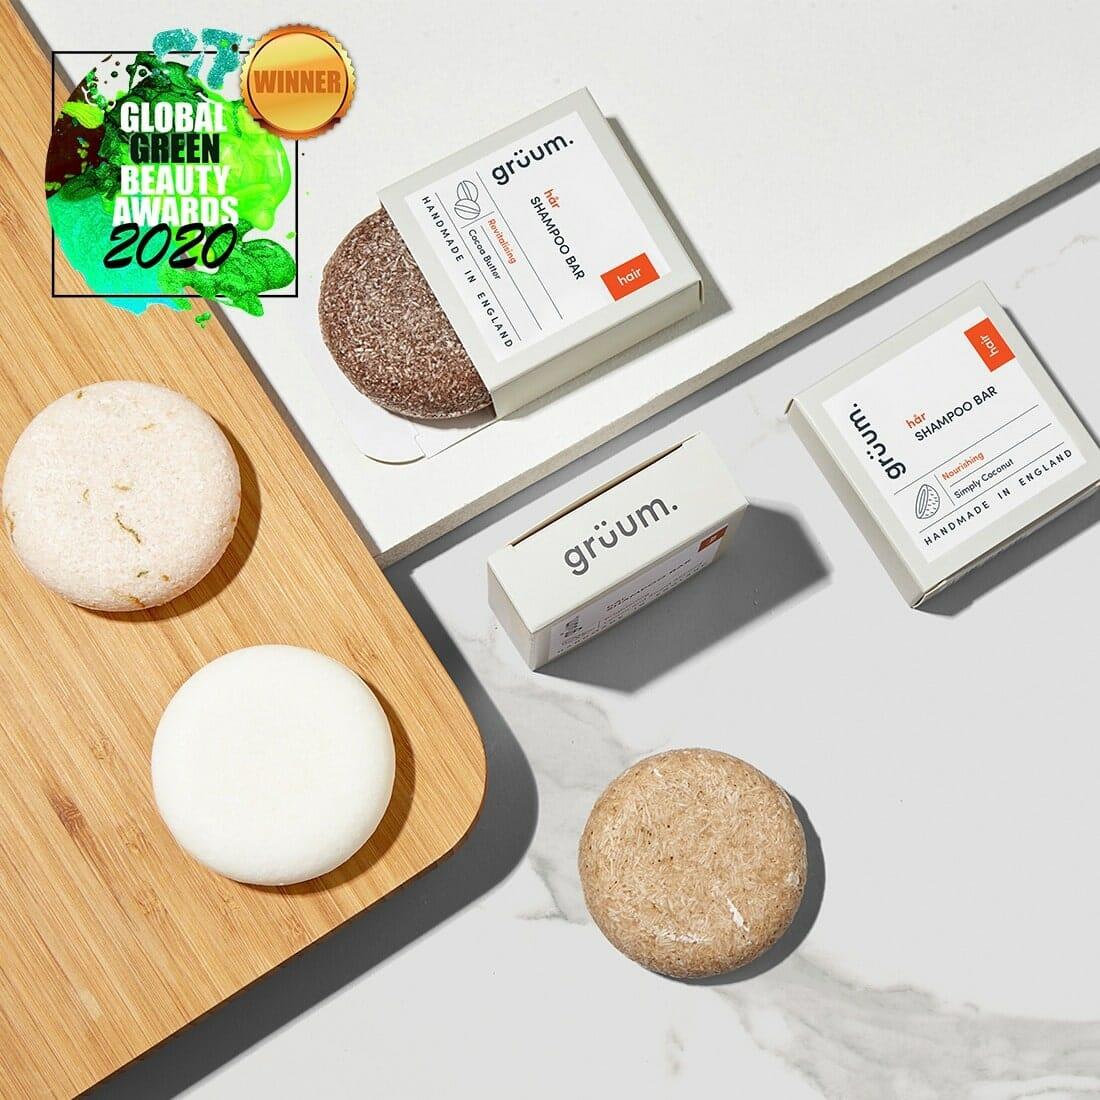 Gruum product image of 4x shampoo bars Global Green Beauty Awards 2020